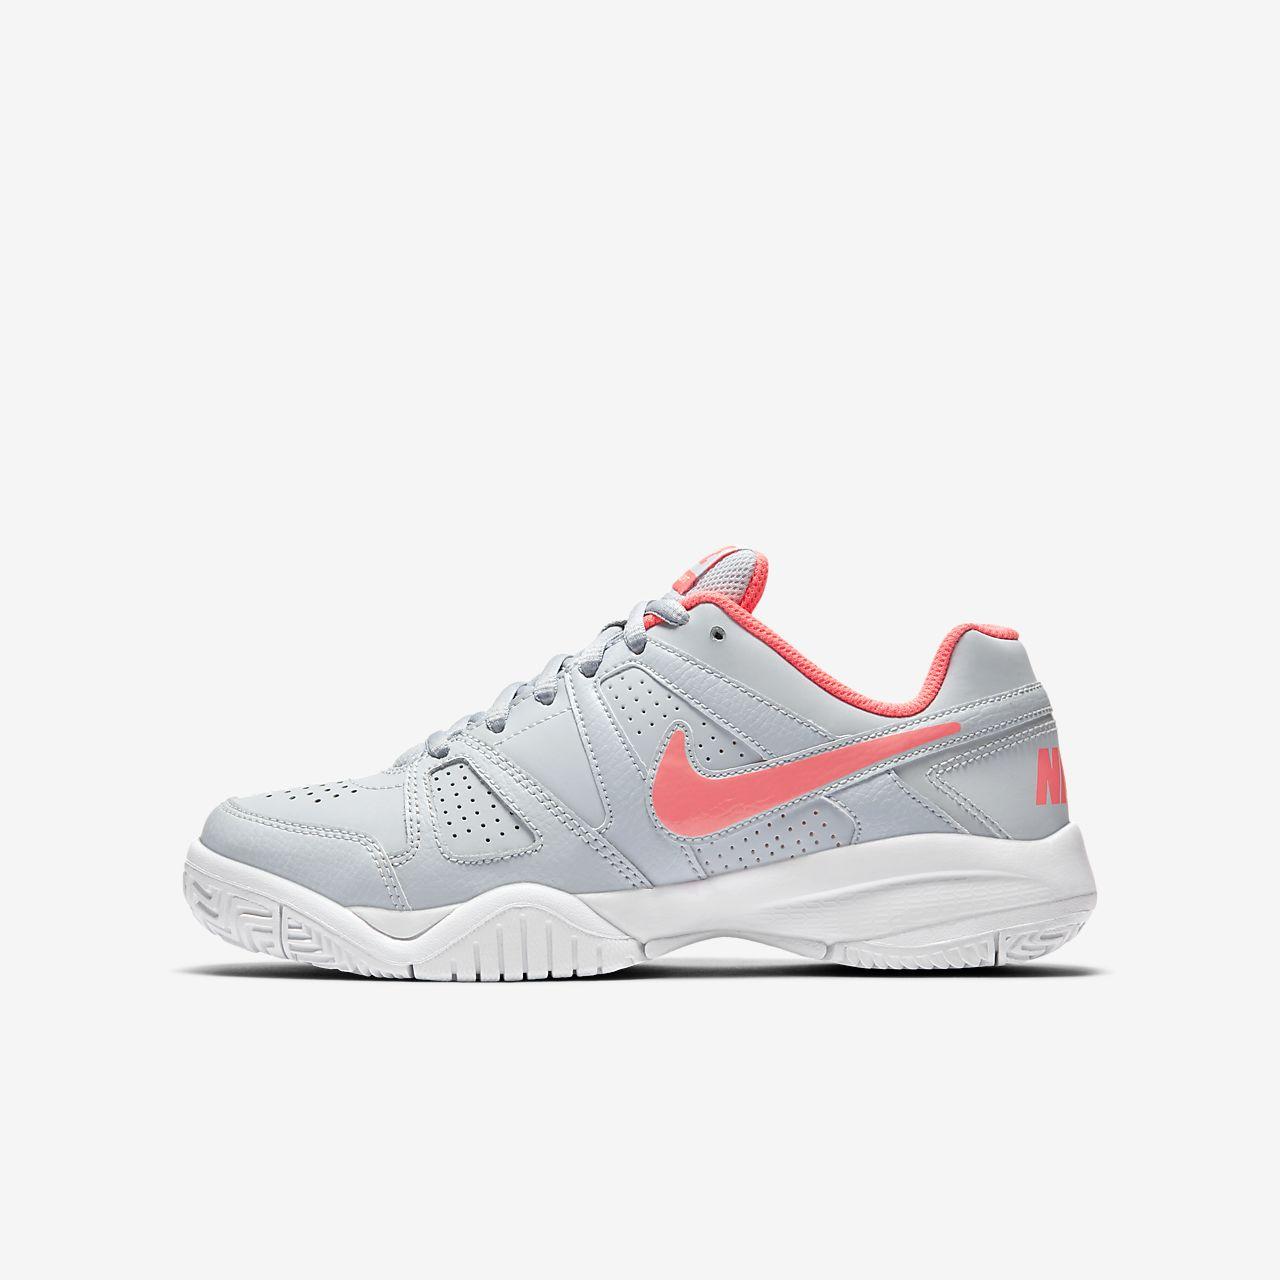 Scarpa da tennis NikeCourt City Court 7 - Ragazzi